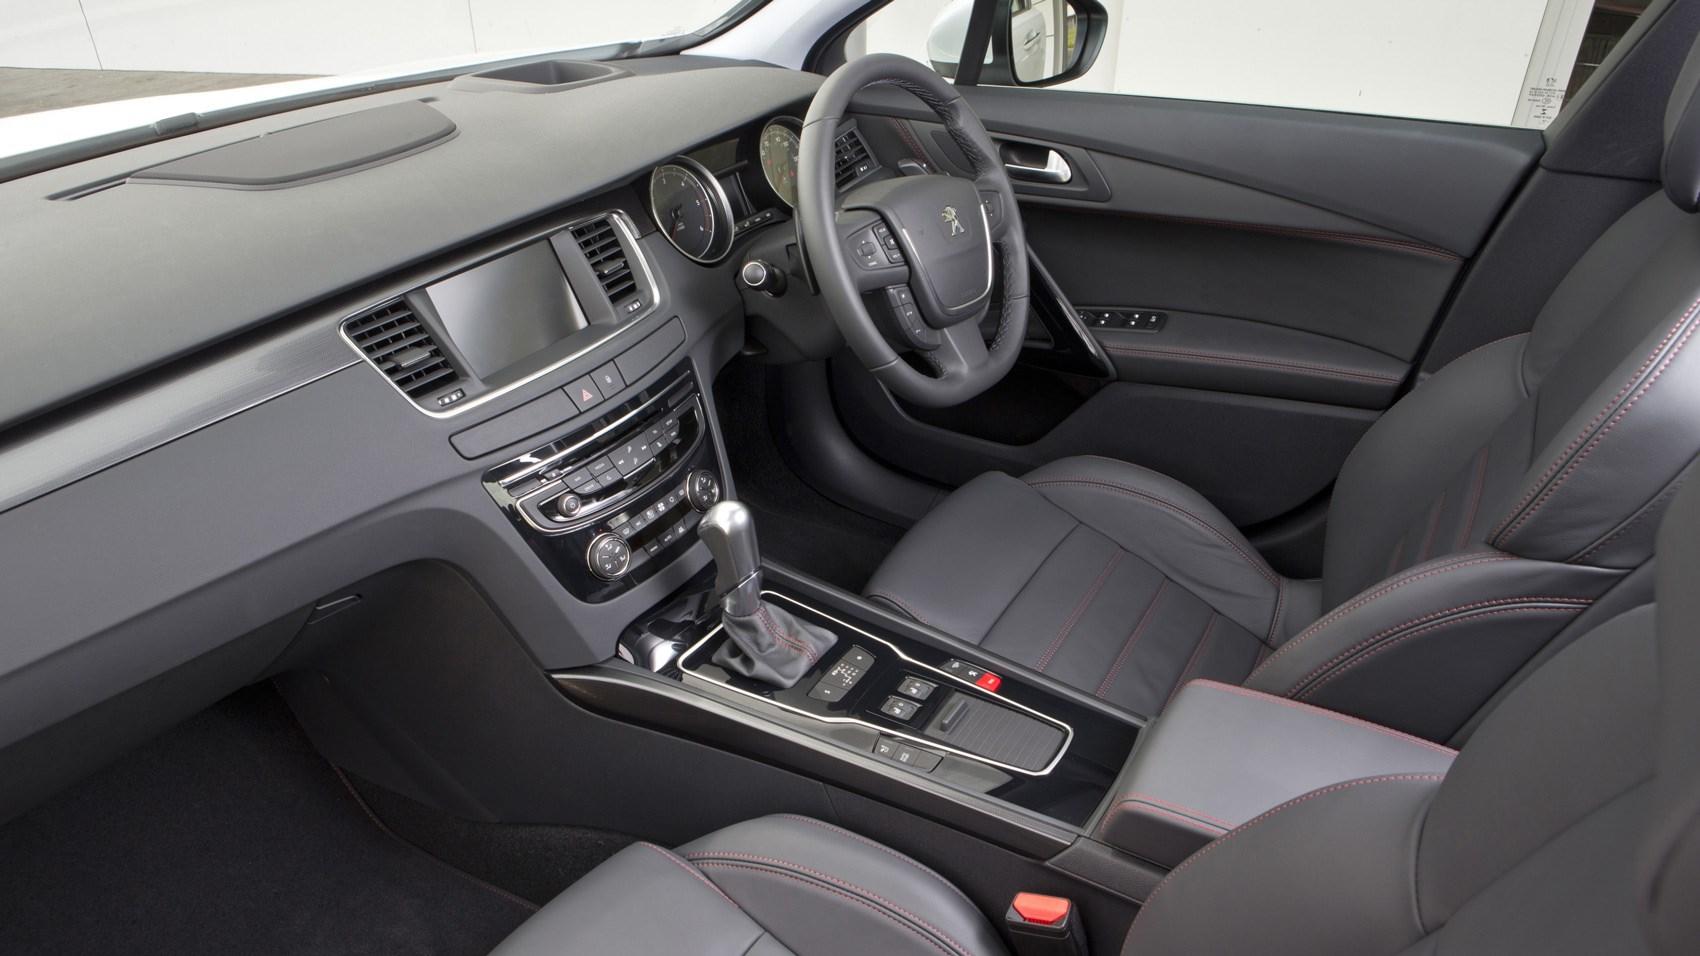 Peugeot 508 Gt Saloon 2017 Review Car Magazine Skoda Octavia 3 Fuse Box Interior